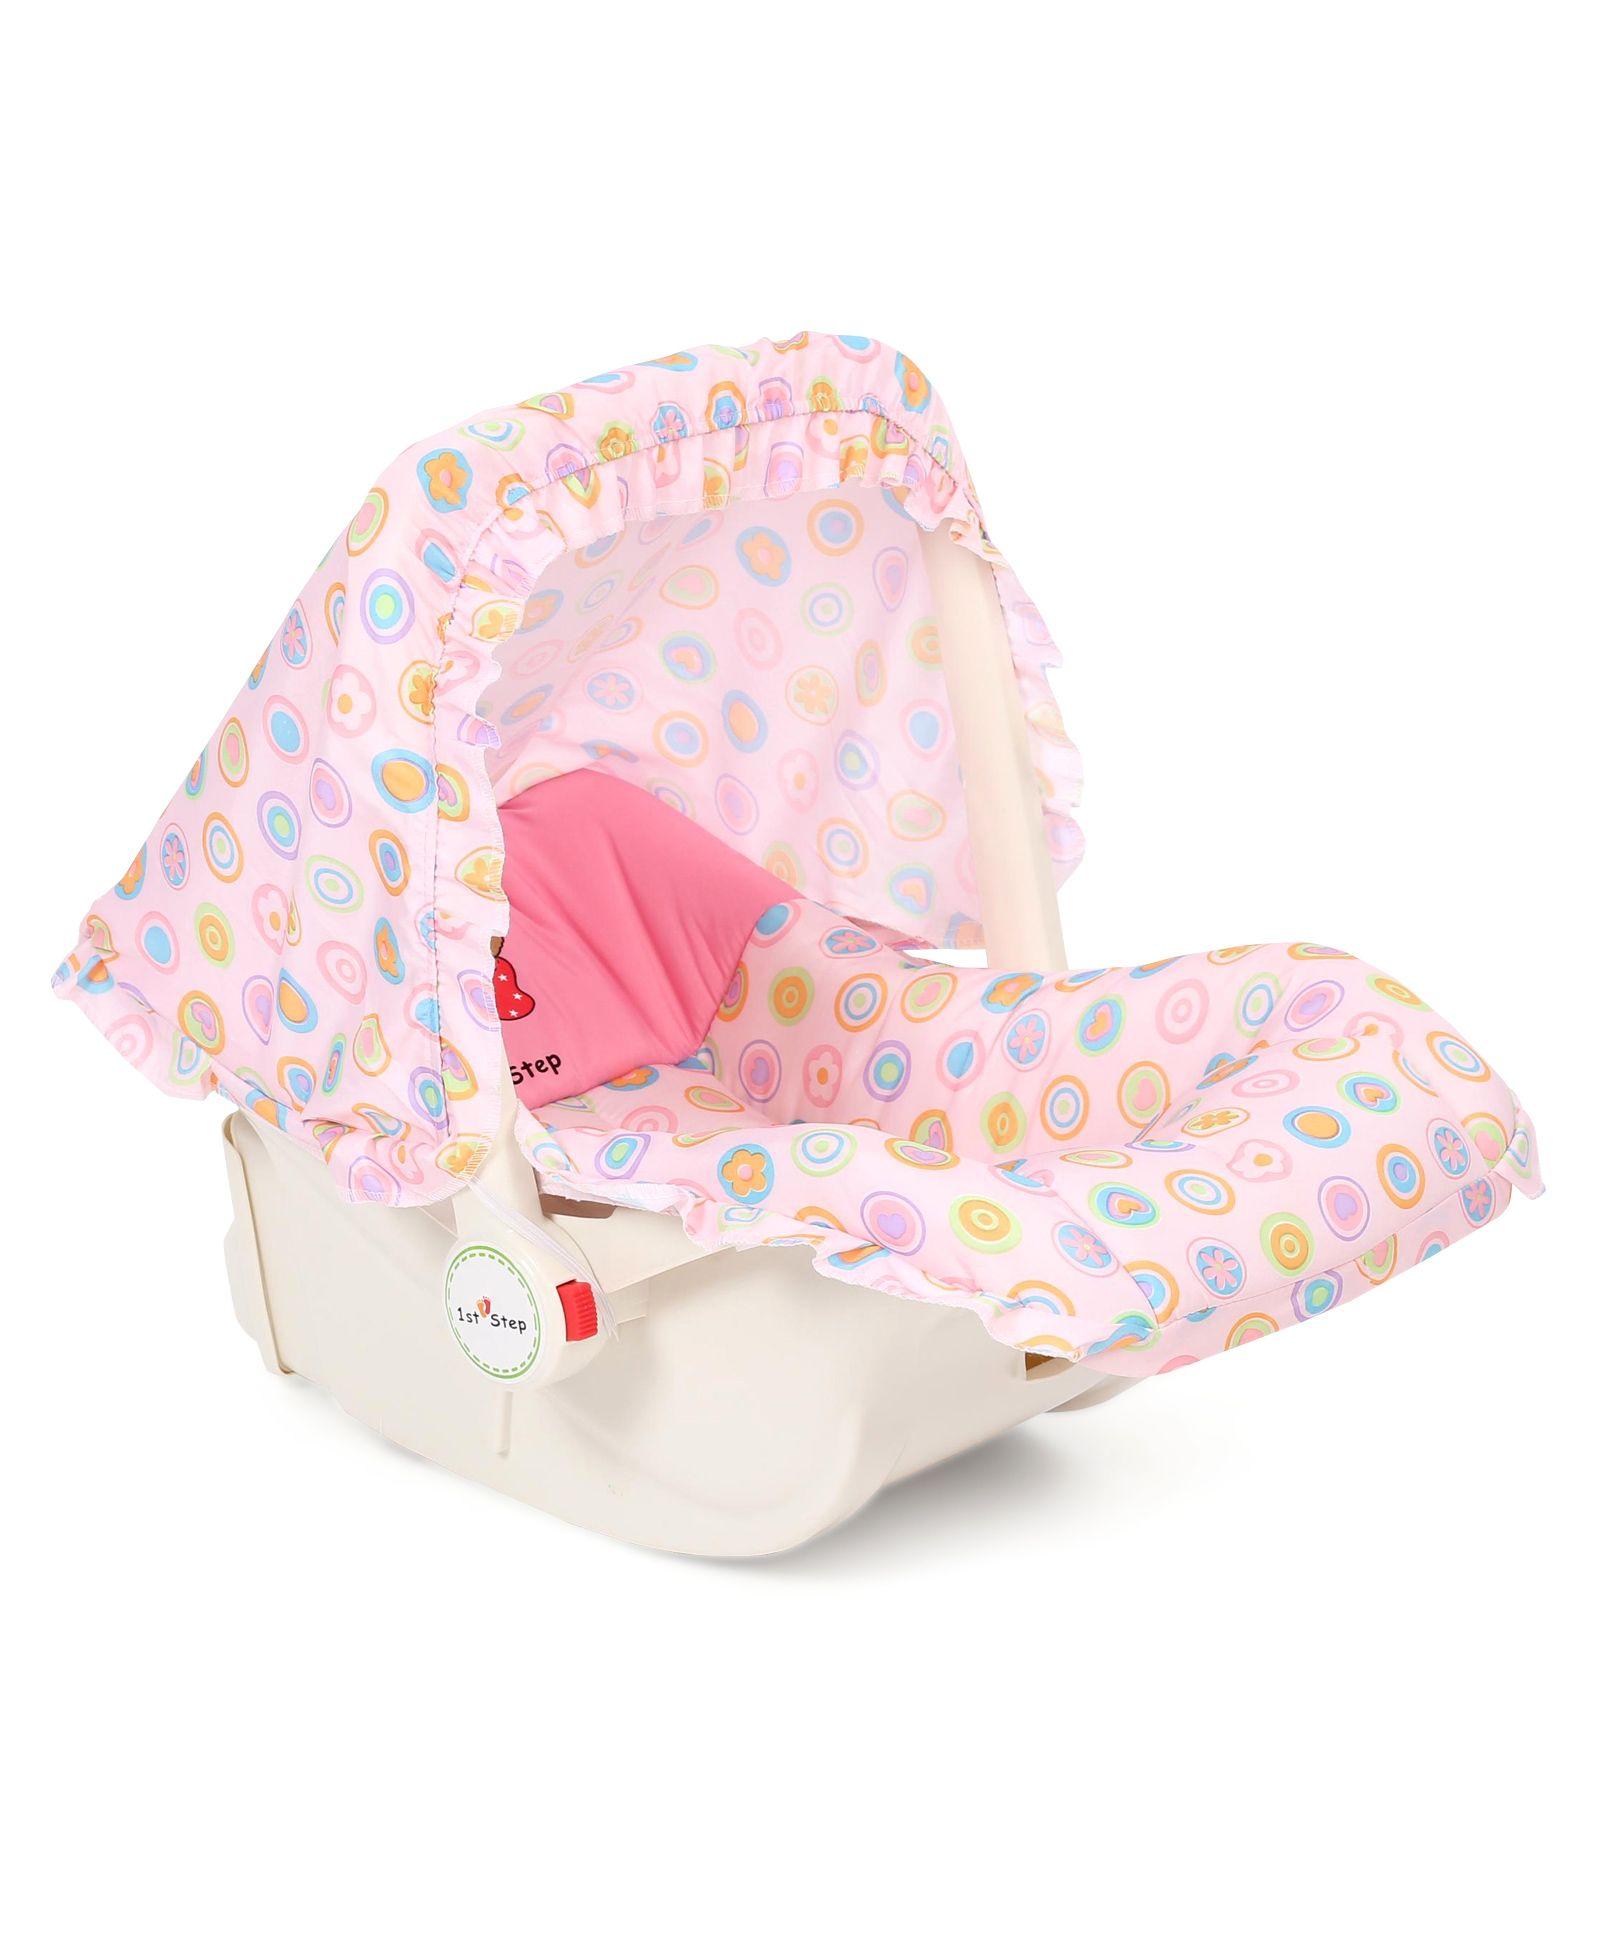 1st Step Baby Carry Cot Cum Rocker - Pink